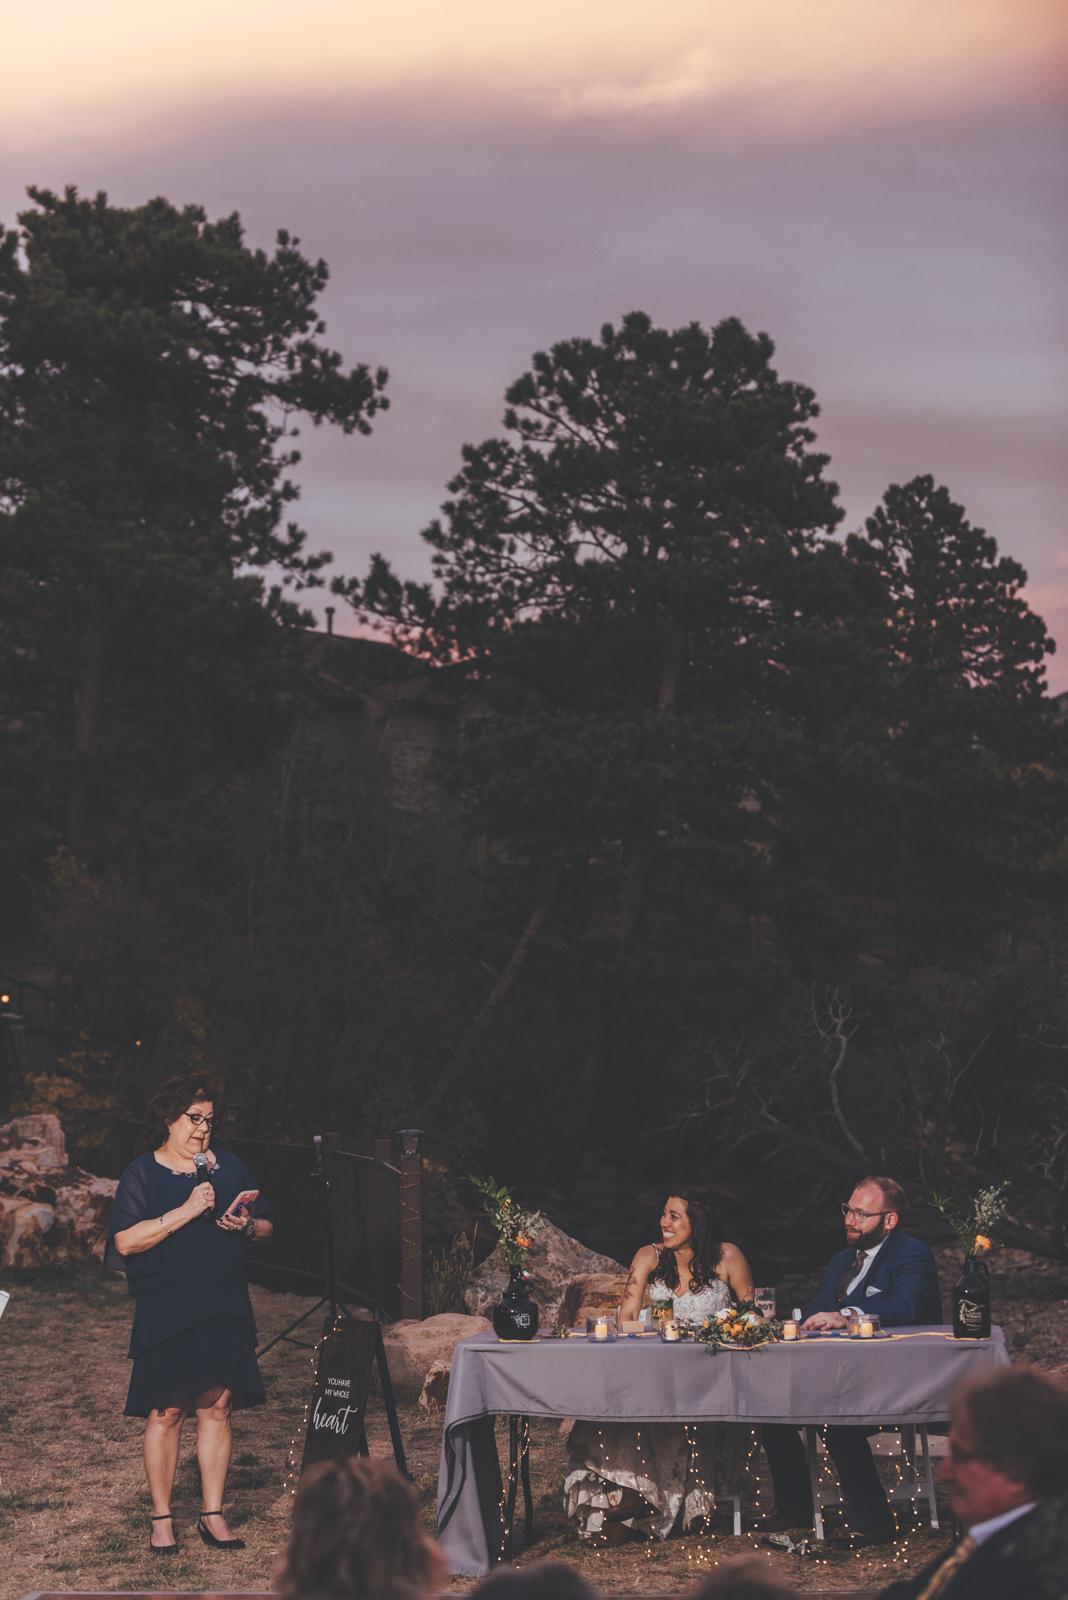 ChadFahnestockPhotography-estes-park-wedding-photography-052.jpg